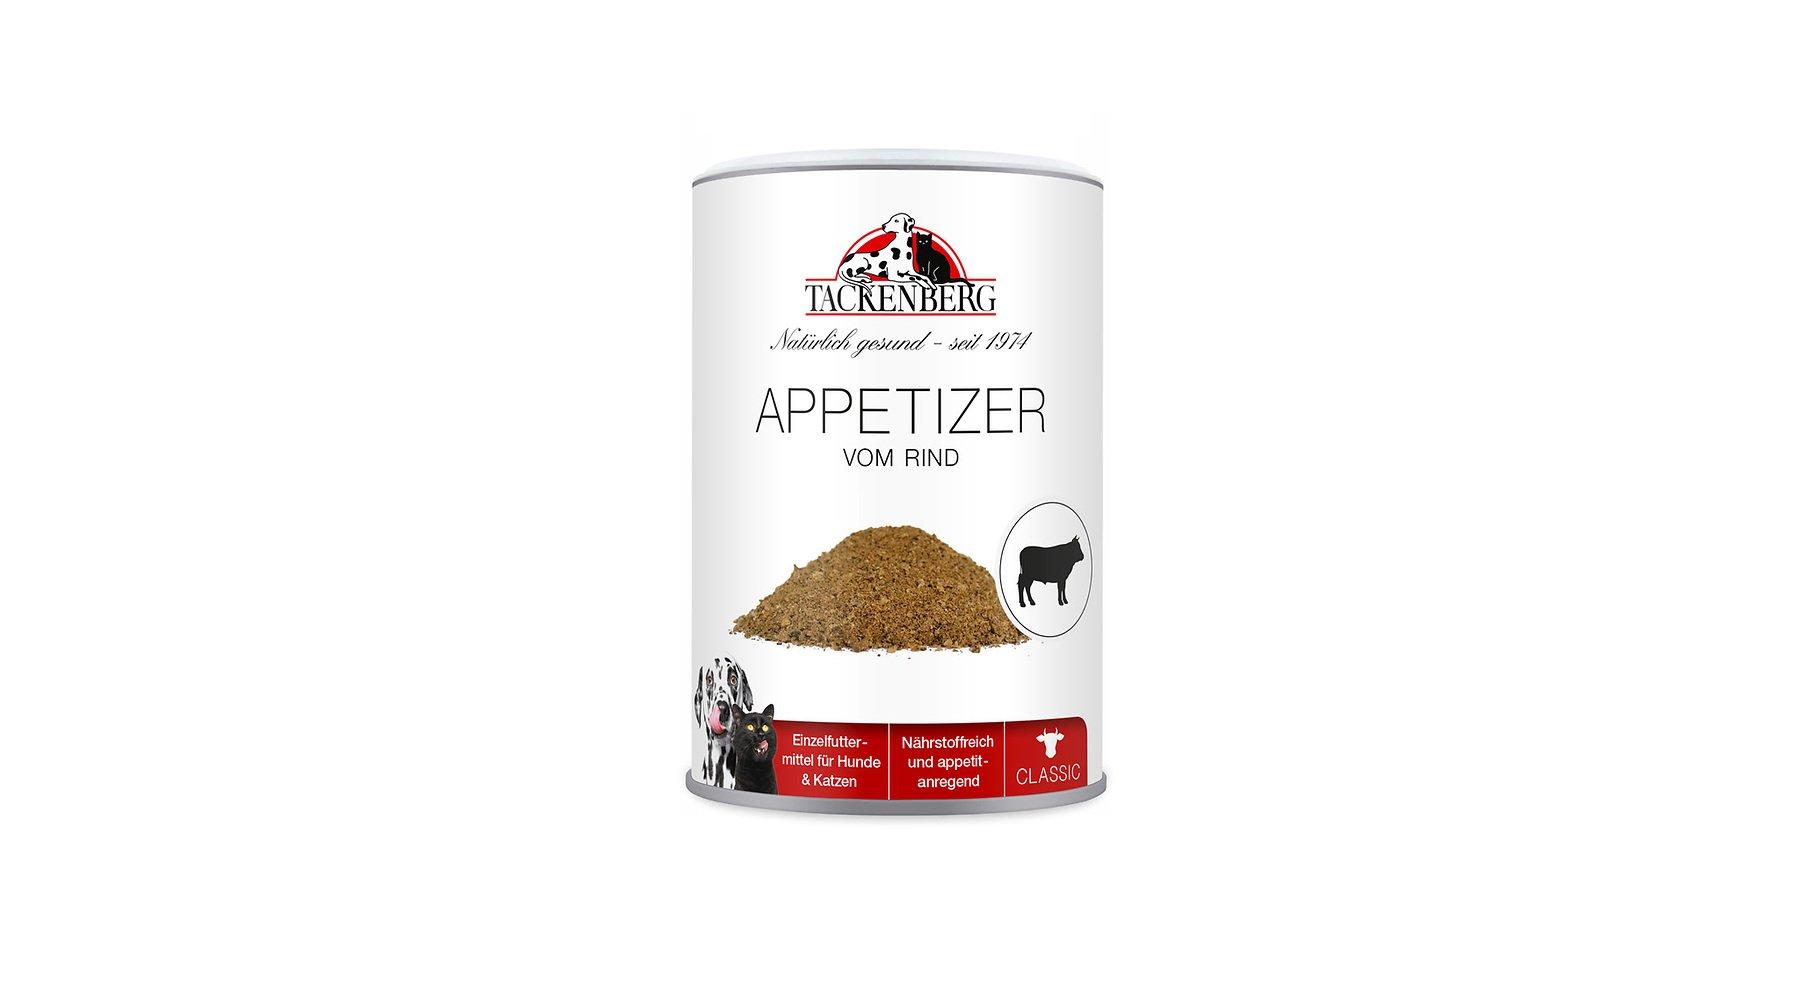 Appetizer vom Rind